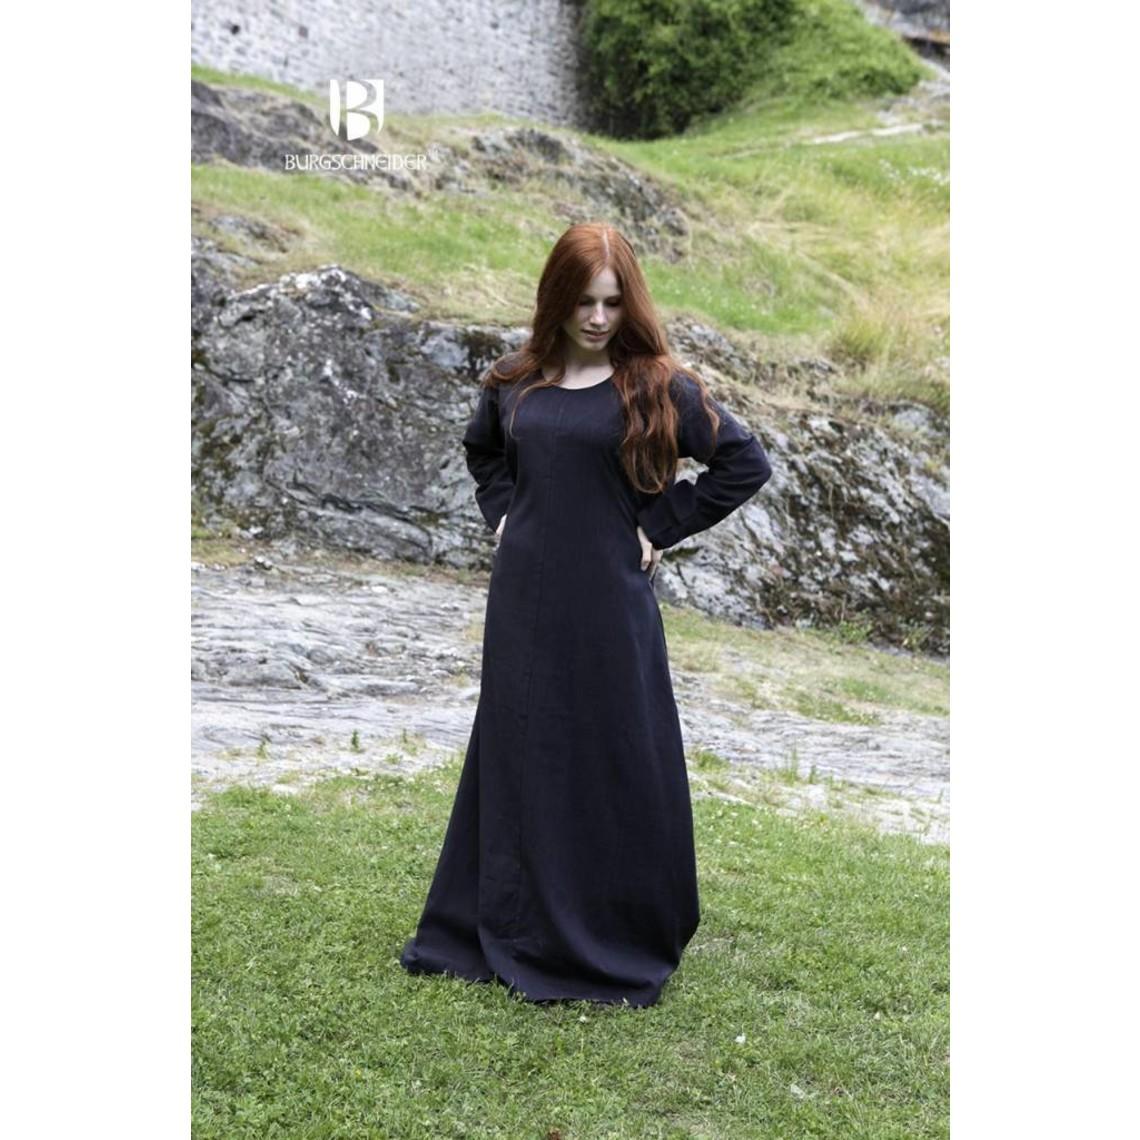 Burgschneider Abito medievale Freya (nero)